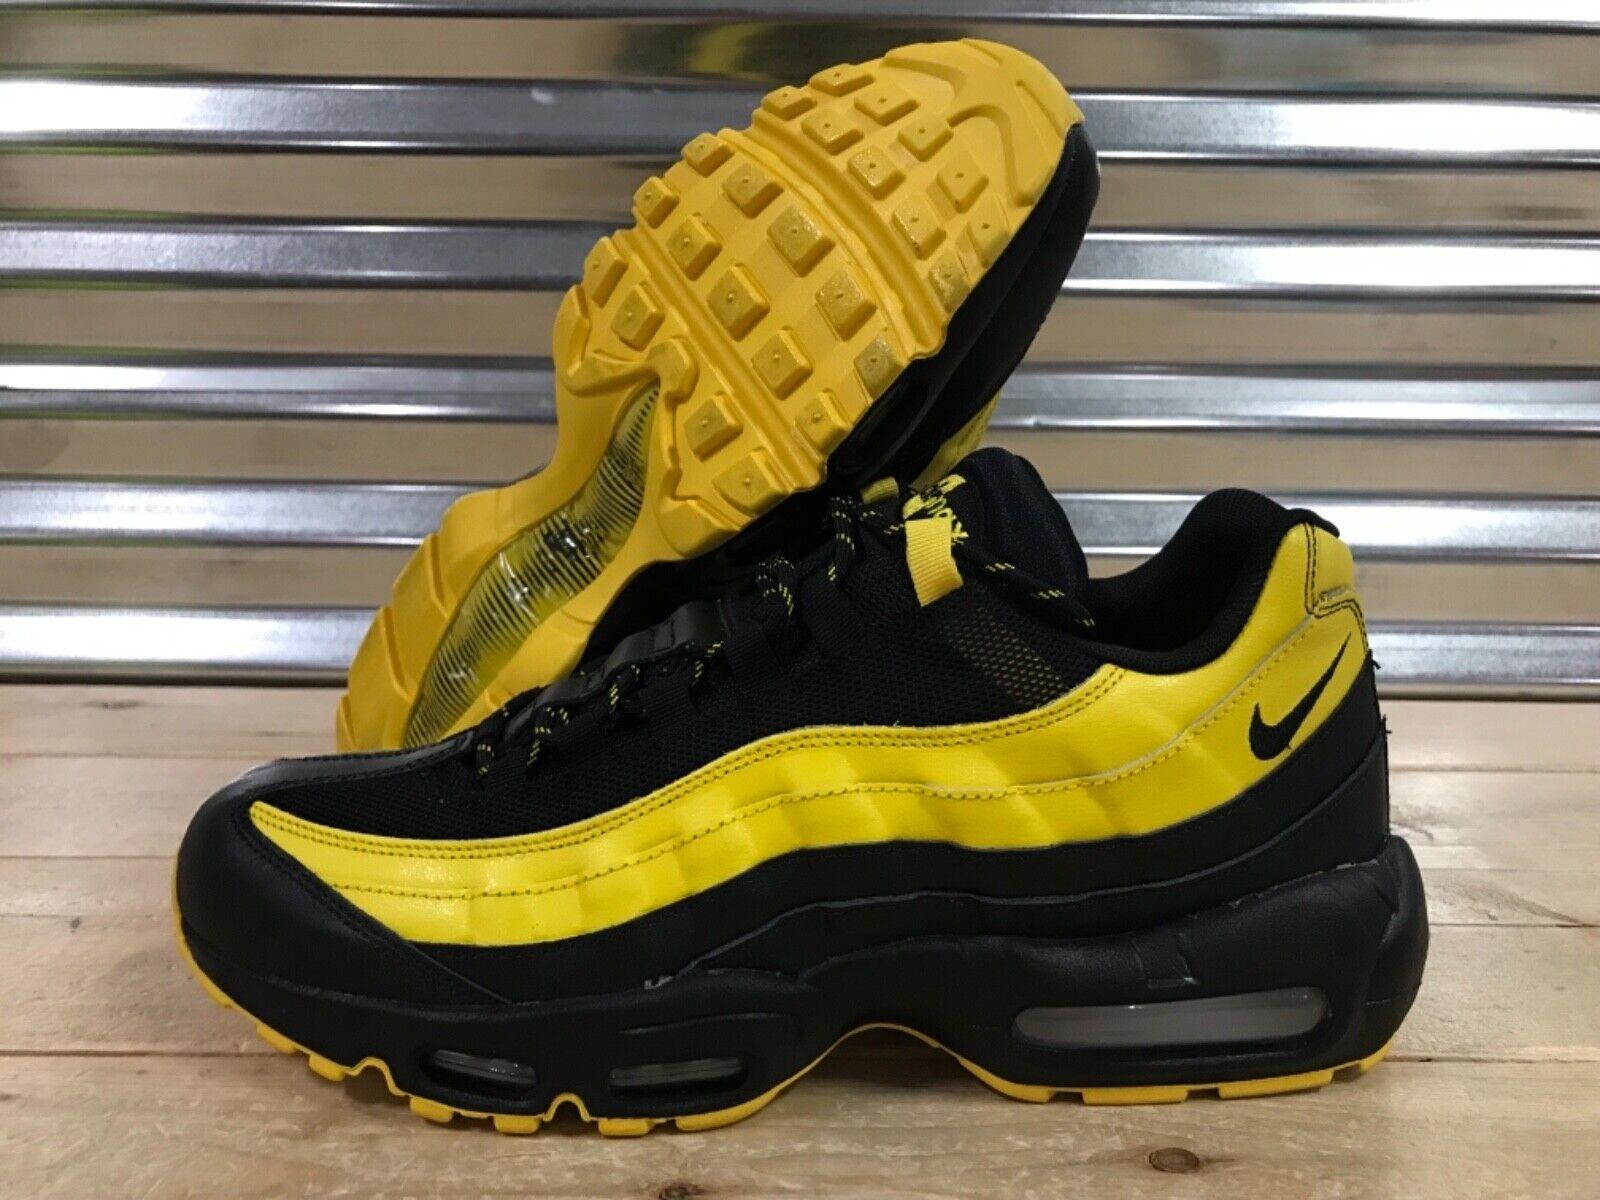 2c381271ca Nike Air Max 95 Premium Pack shoes Tour Yellow Black ( AV7939-001 ) SZ  Frequency nuxhgp4042-Men's Athletic Shoes